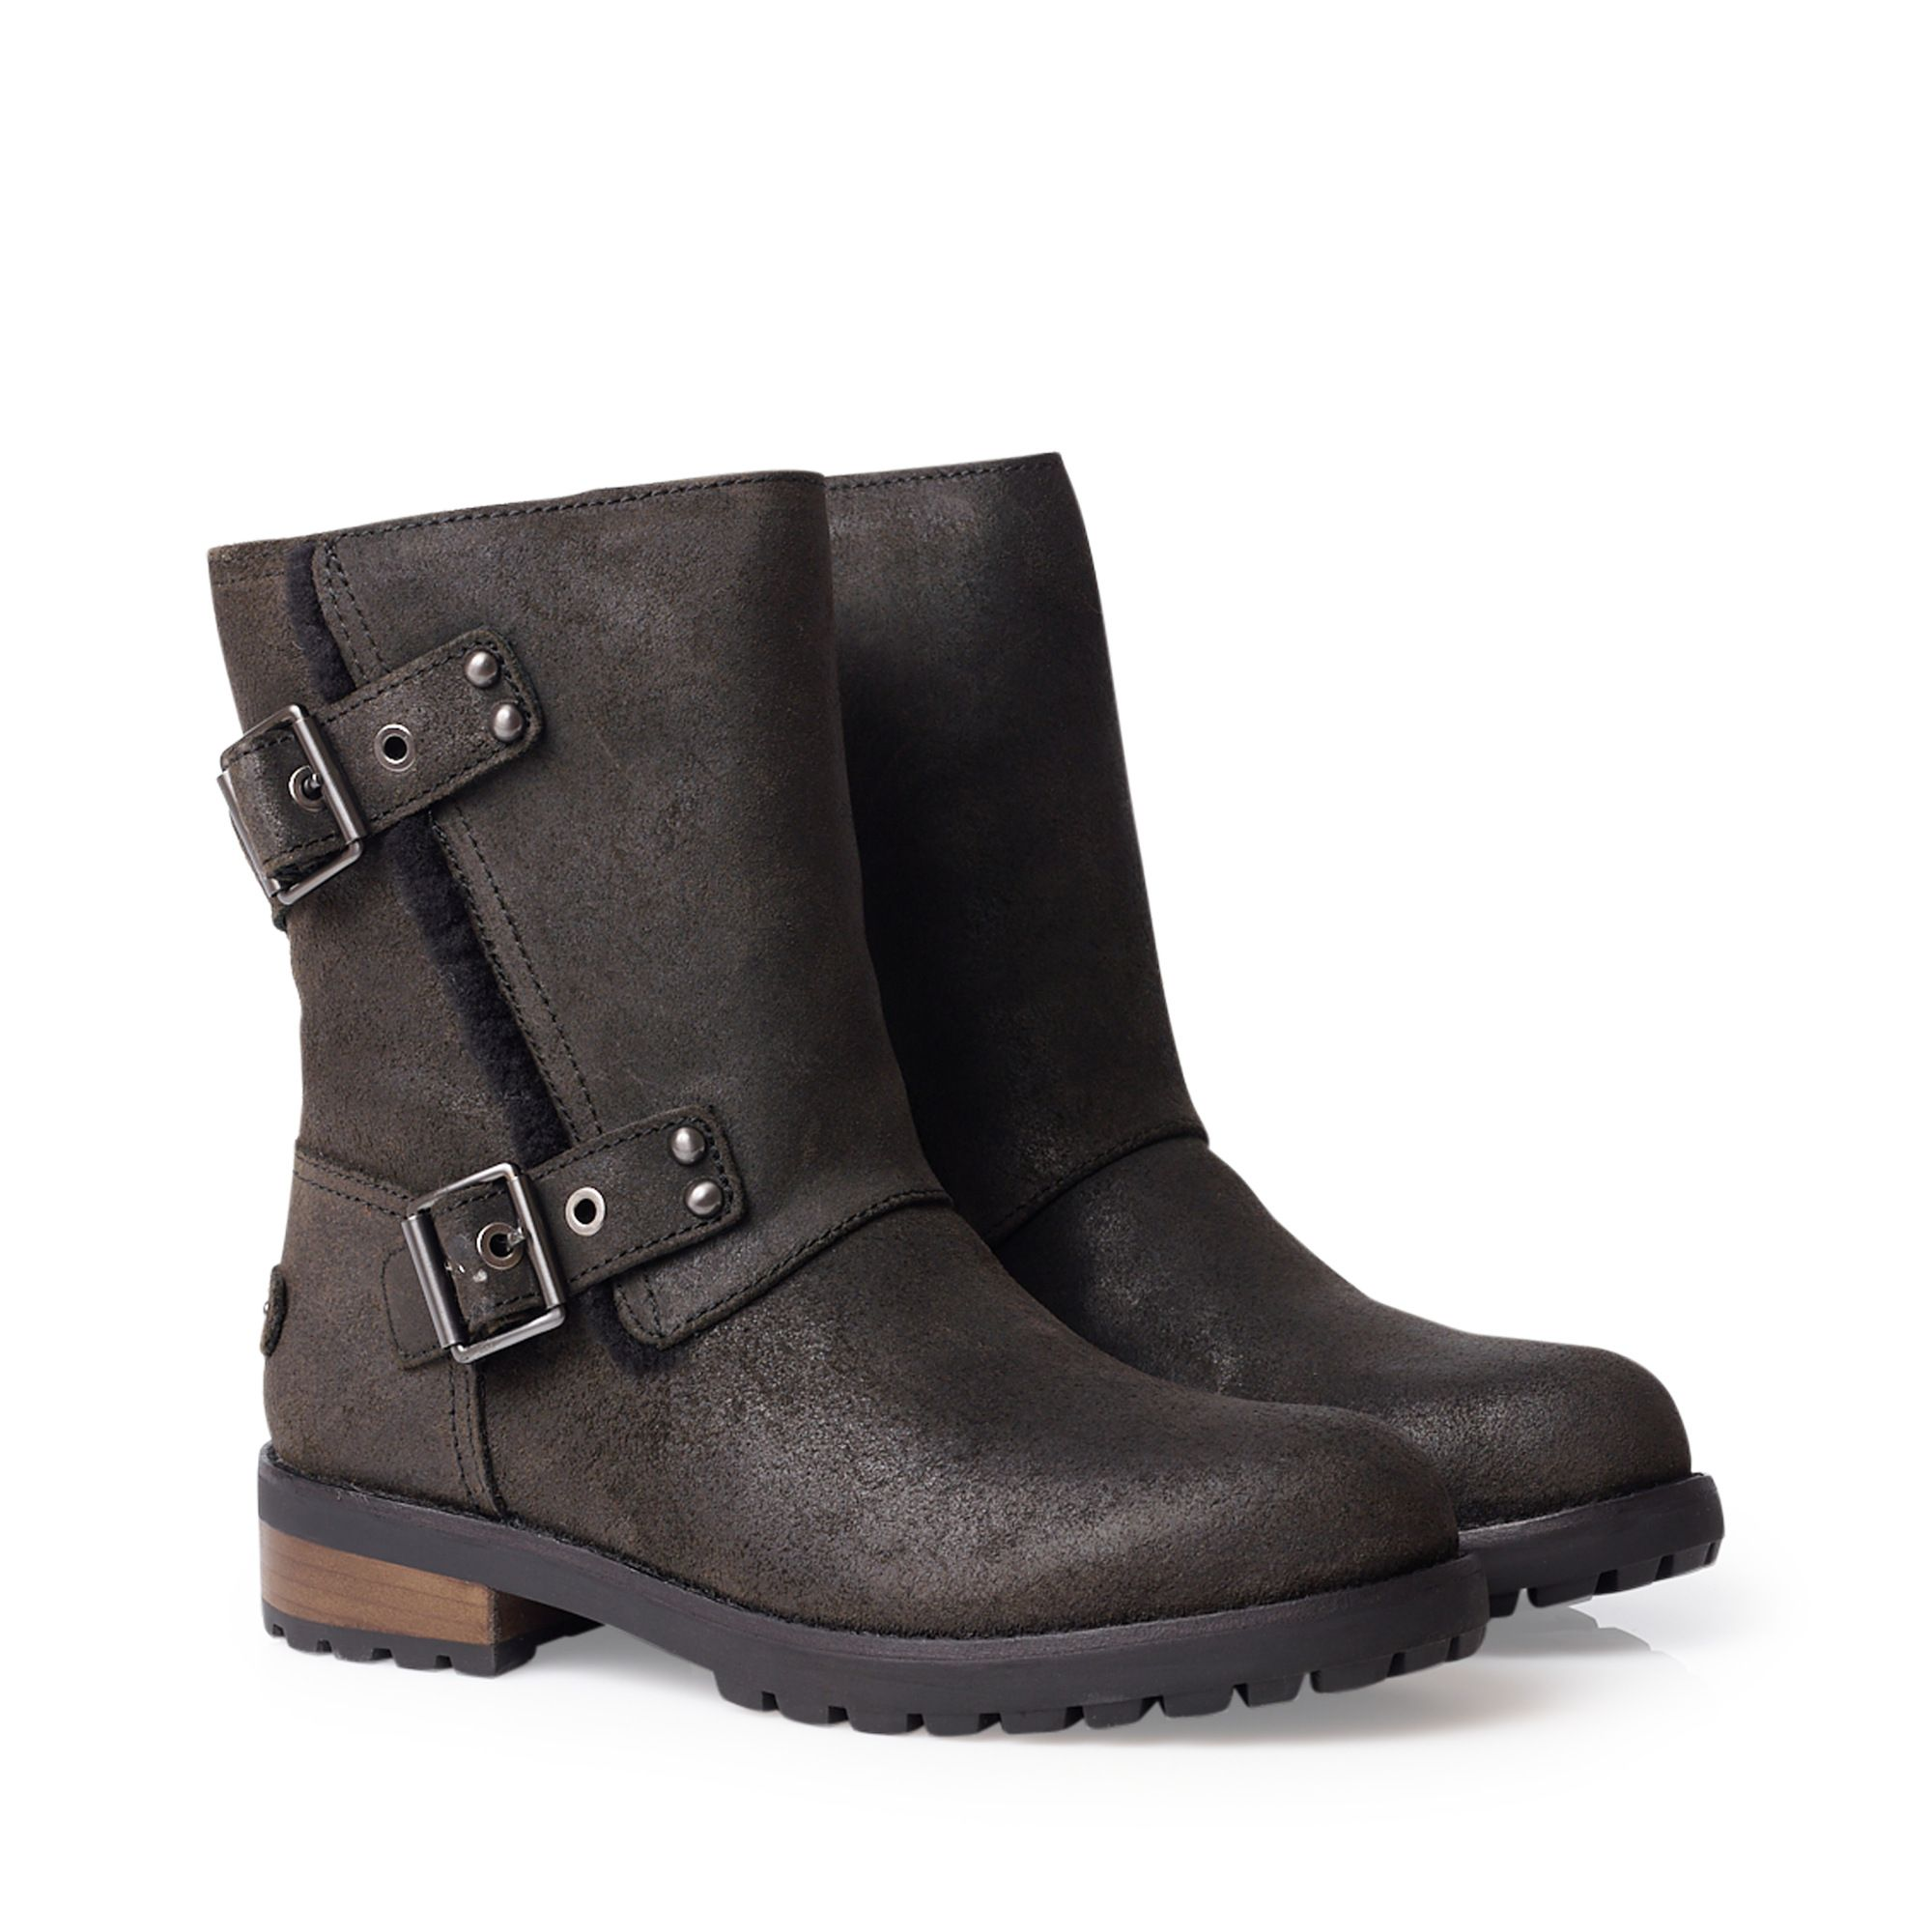 28bc189a398 UGG Niels II varmfodrade boots i fårskinn, Svart, 6 UGG - KompisShopping